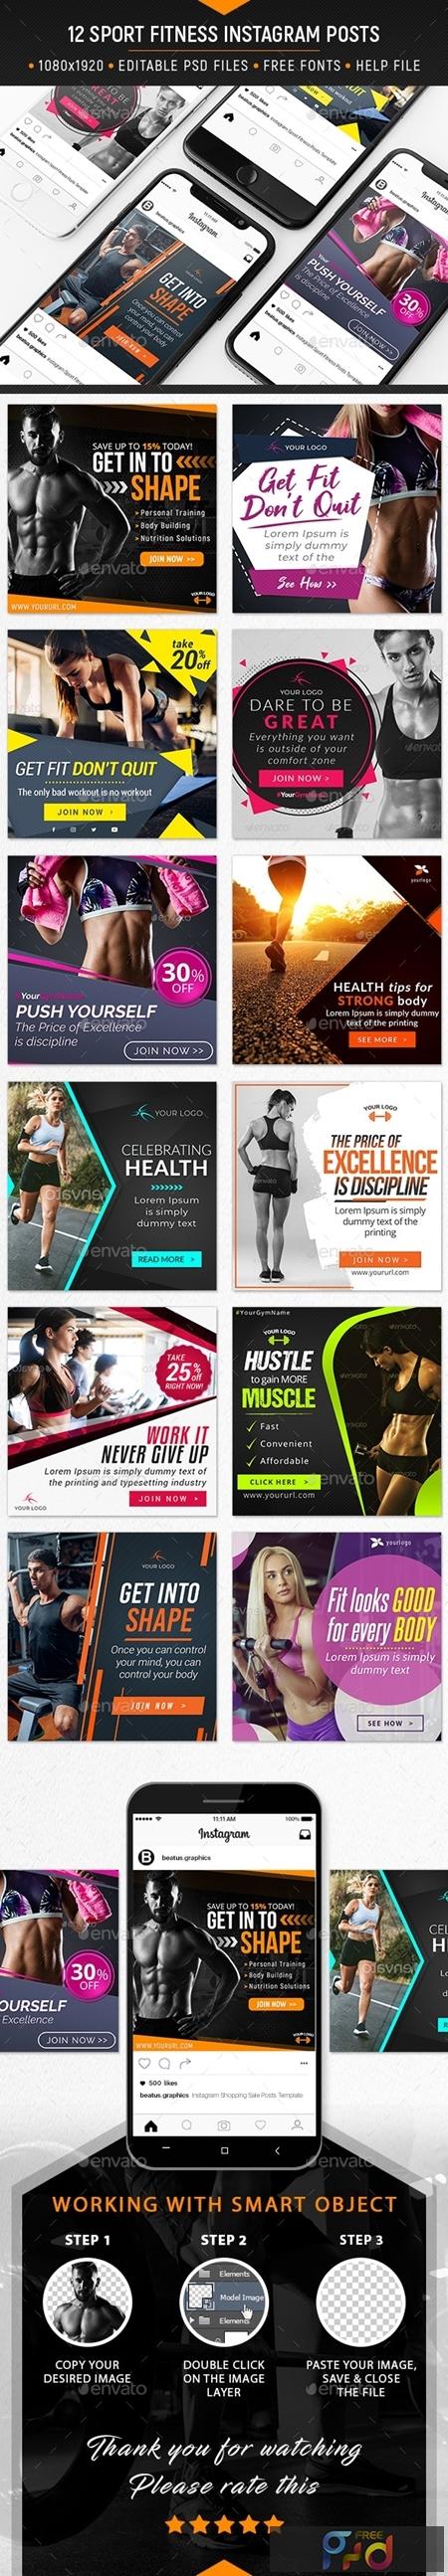 Instagram Sport Fitness Posts 25673118 1